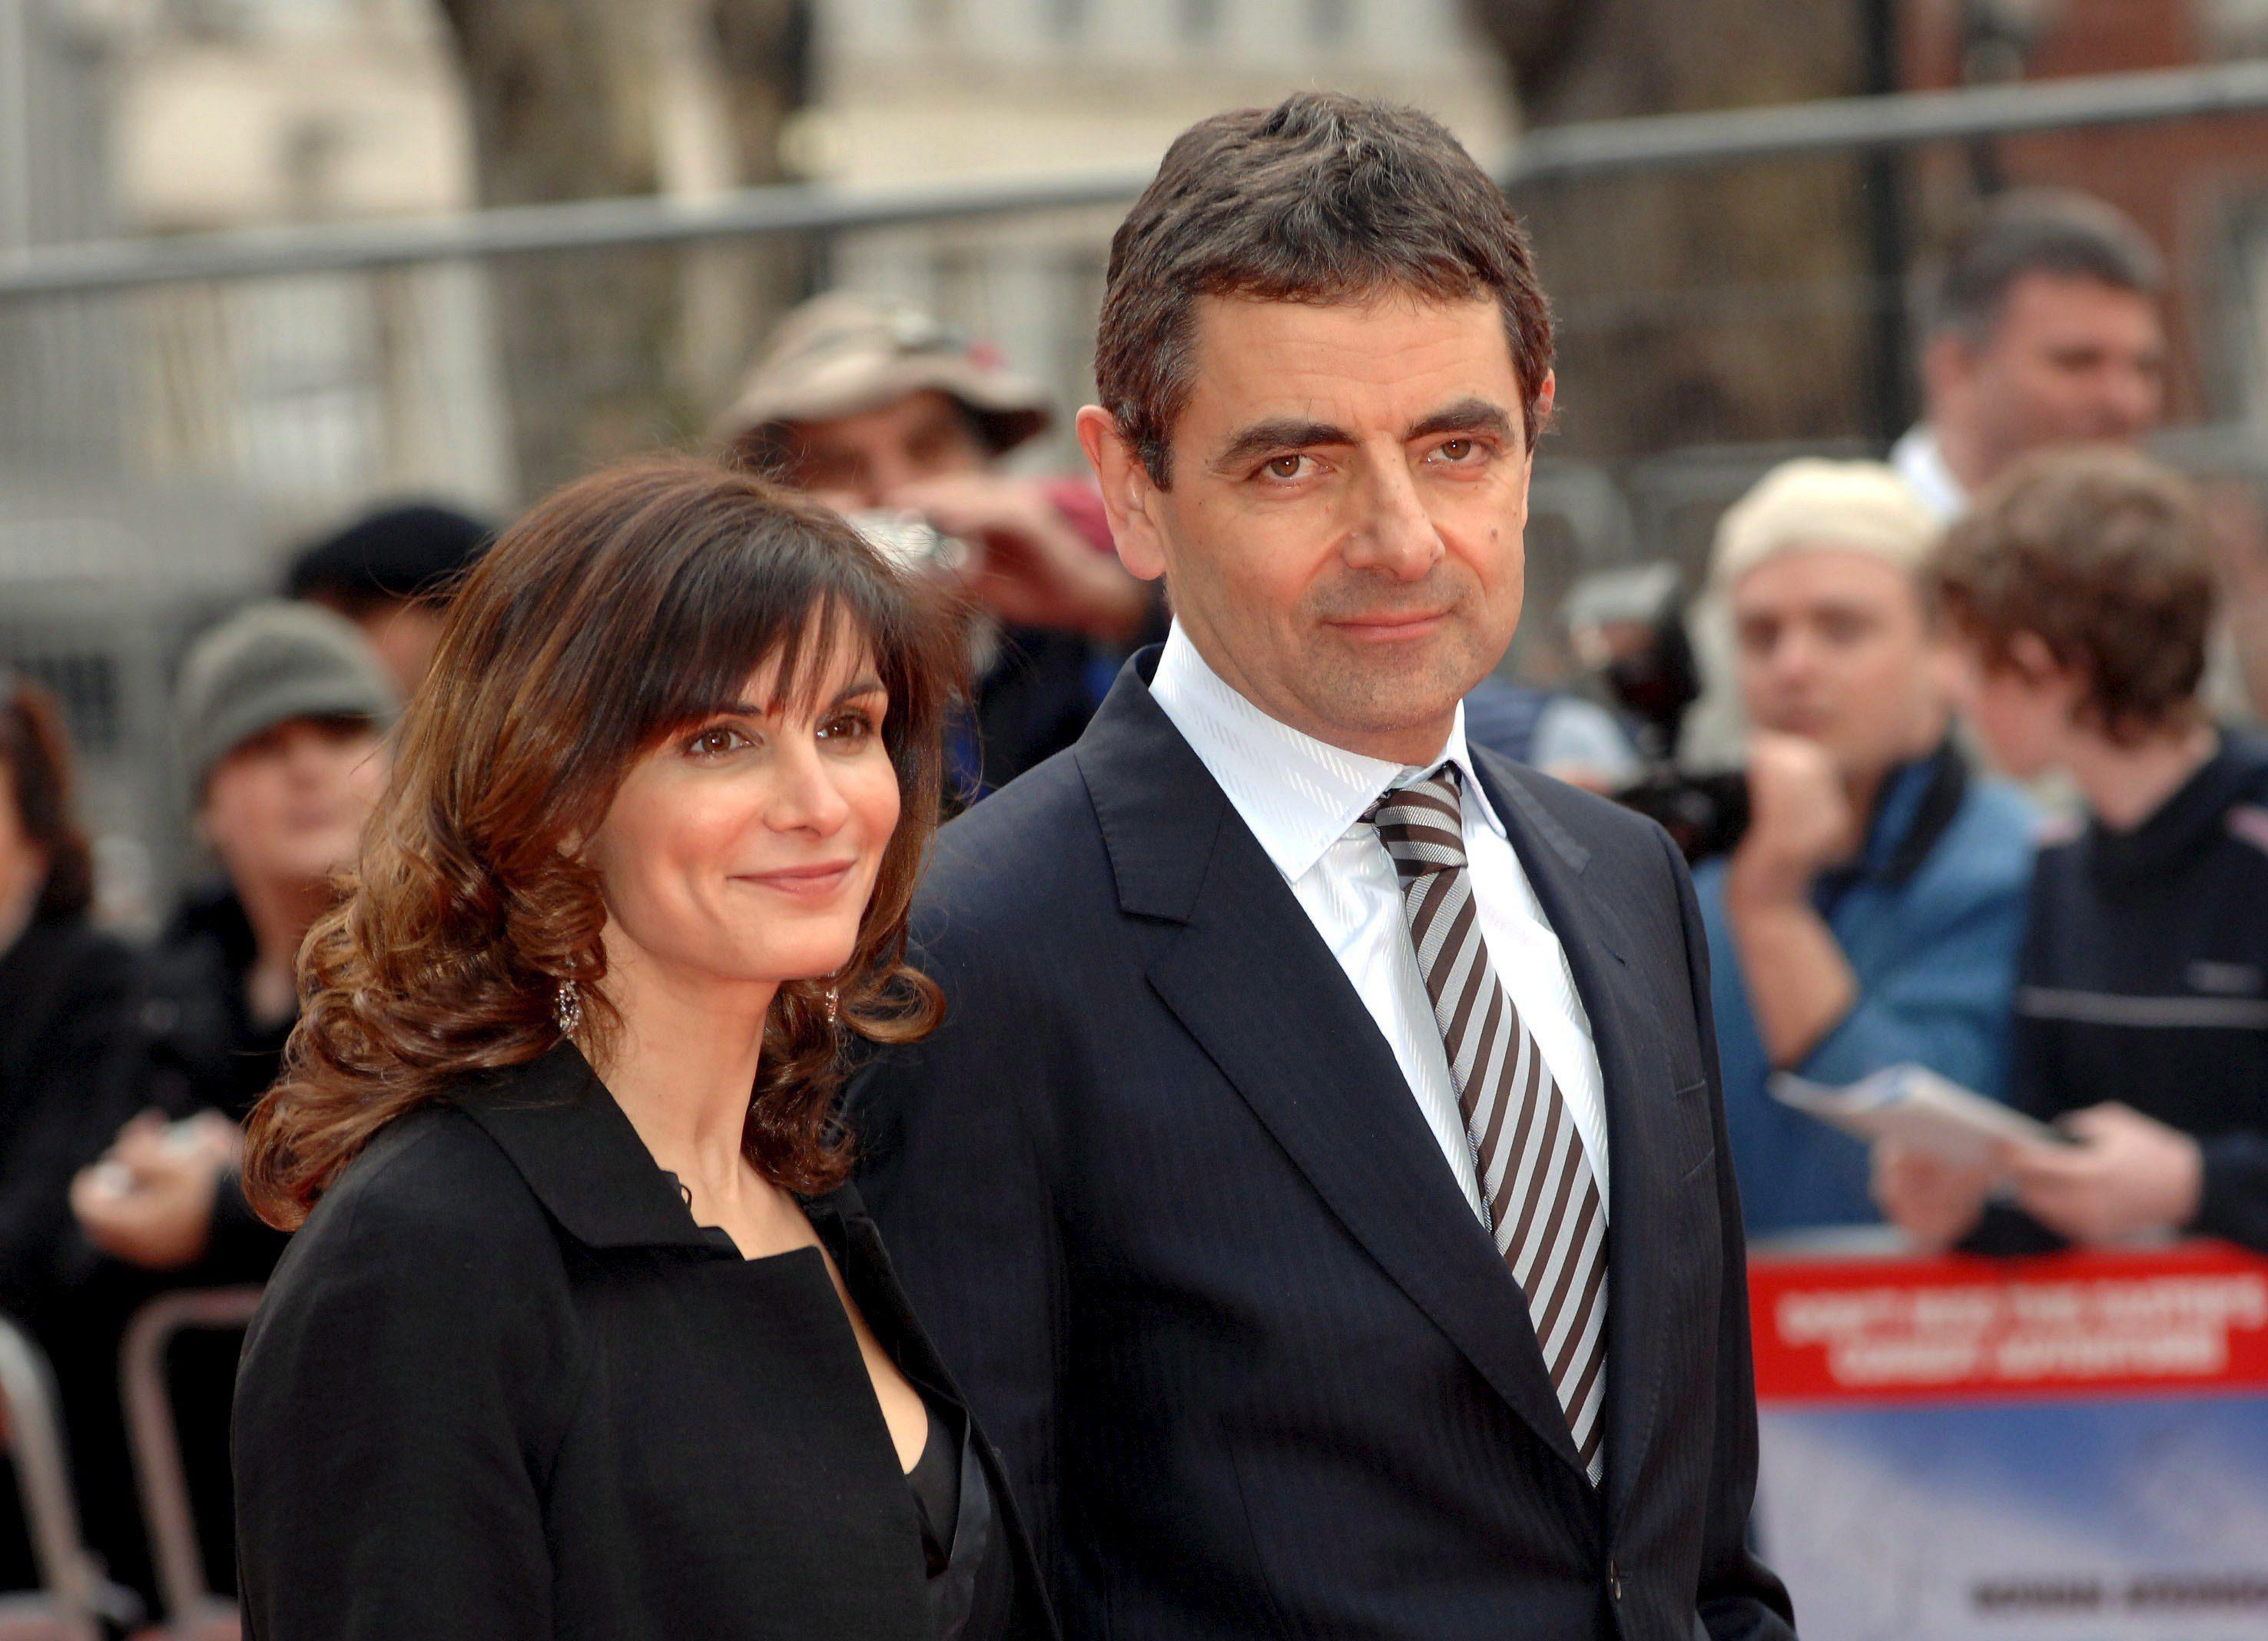 Doi tu gay tranh cai cua 'Mr. Bean' hinh anh 6